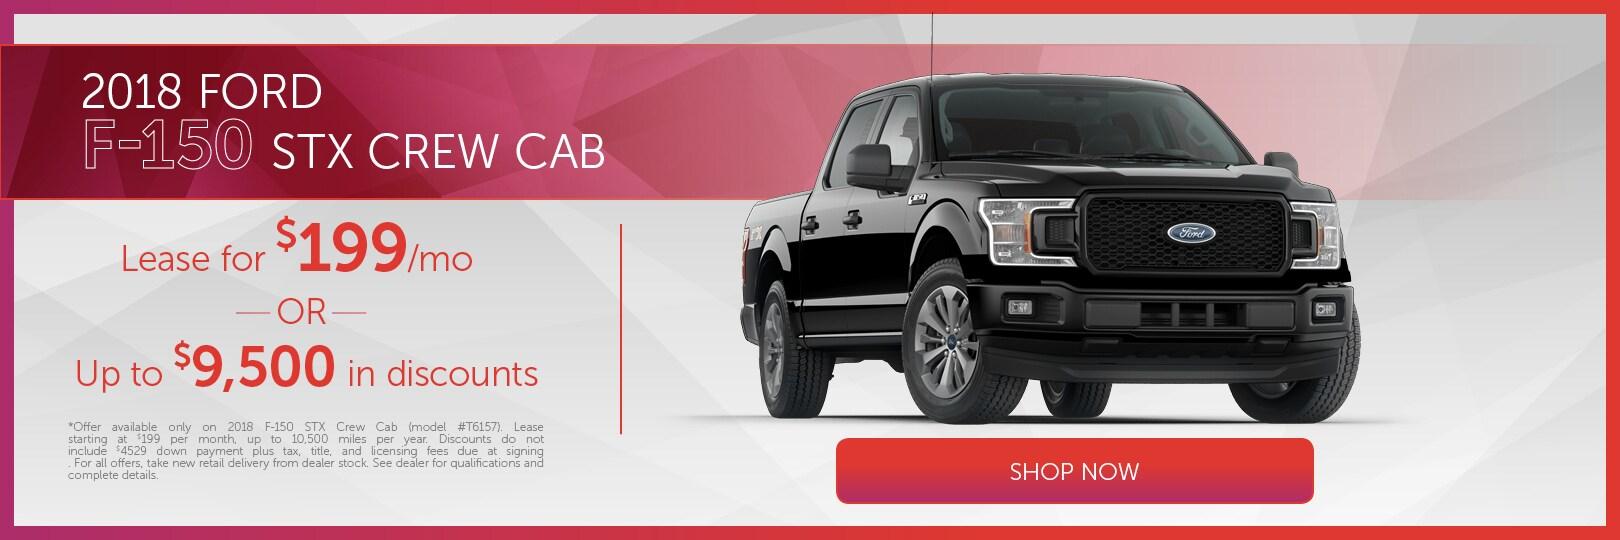 Ford Dealerships Mn Best Image FiccioNet - Ford dealerships mn